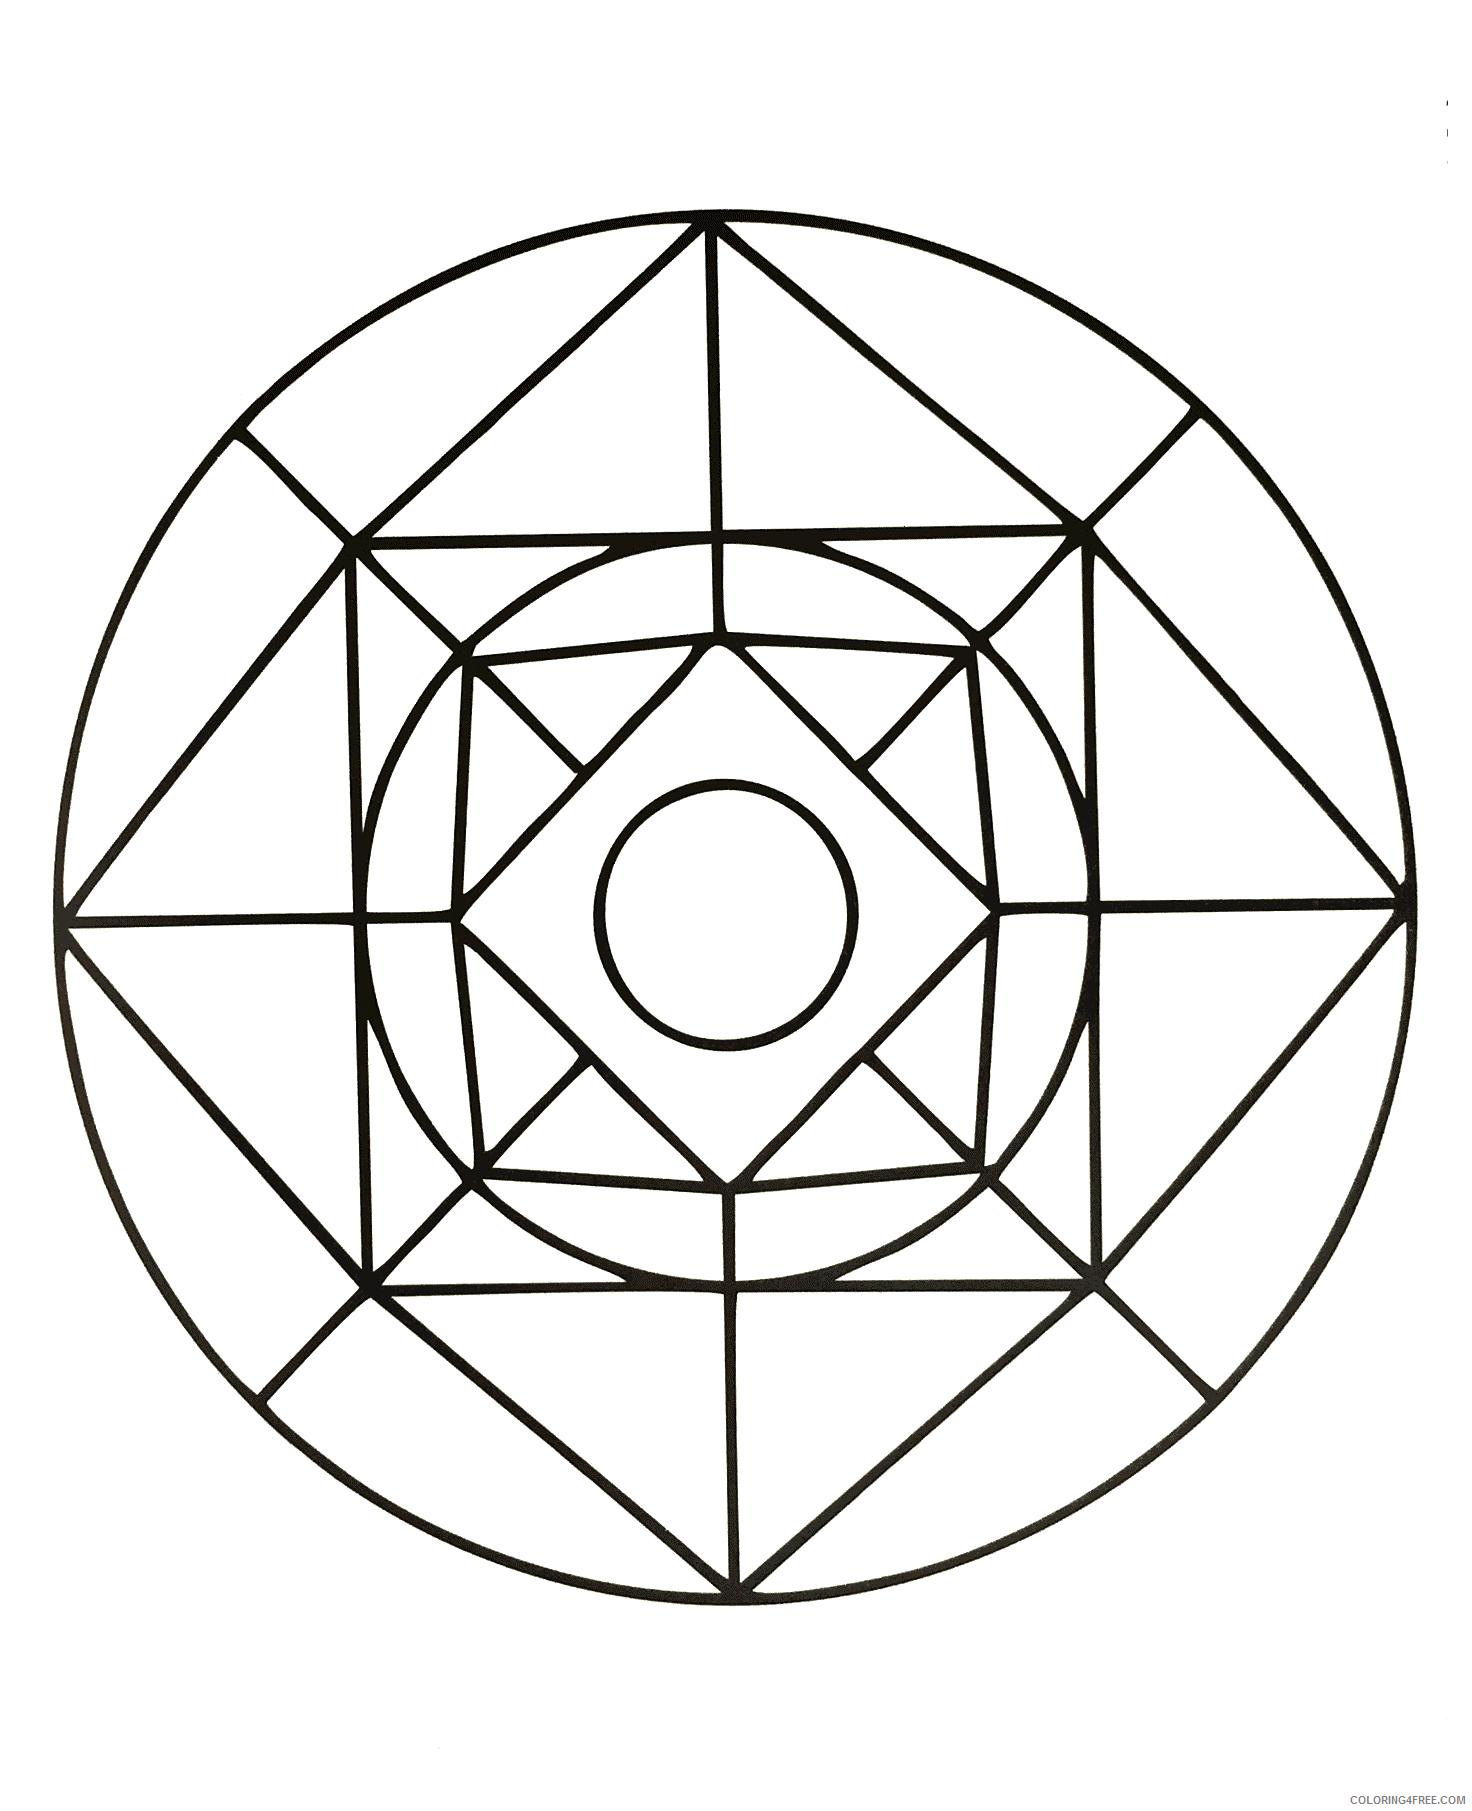 Mandala Coloring Pages Adult free to print Printable 2020 512 Coloring4free